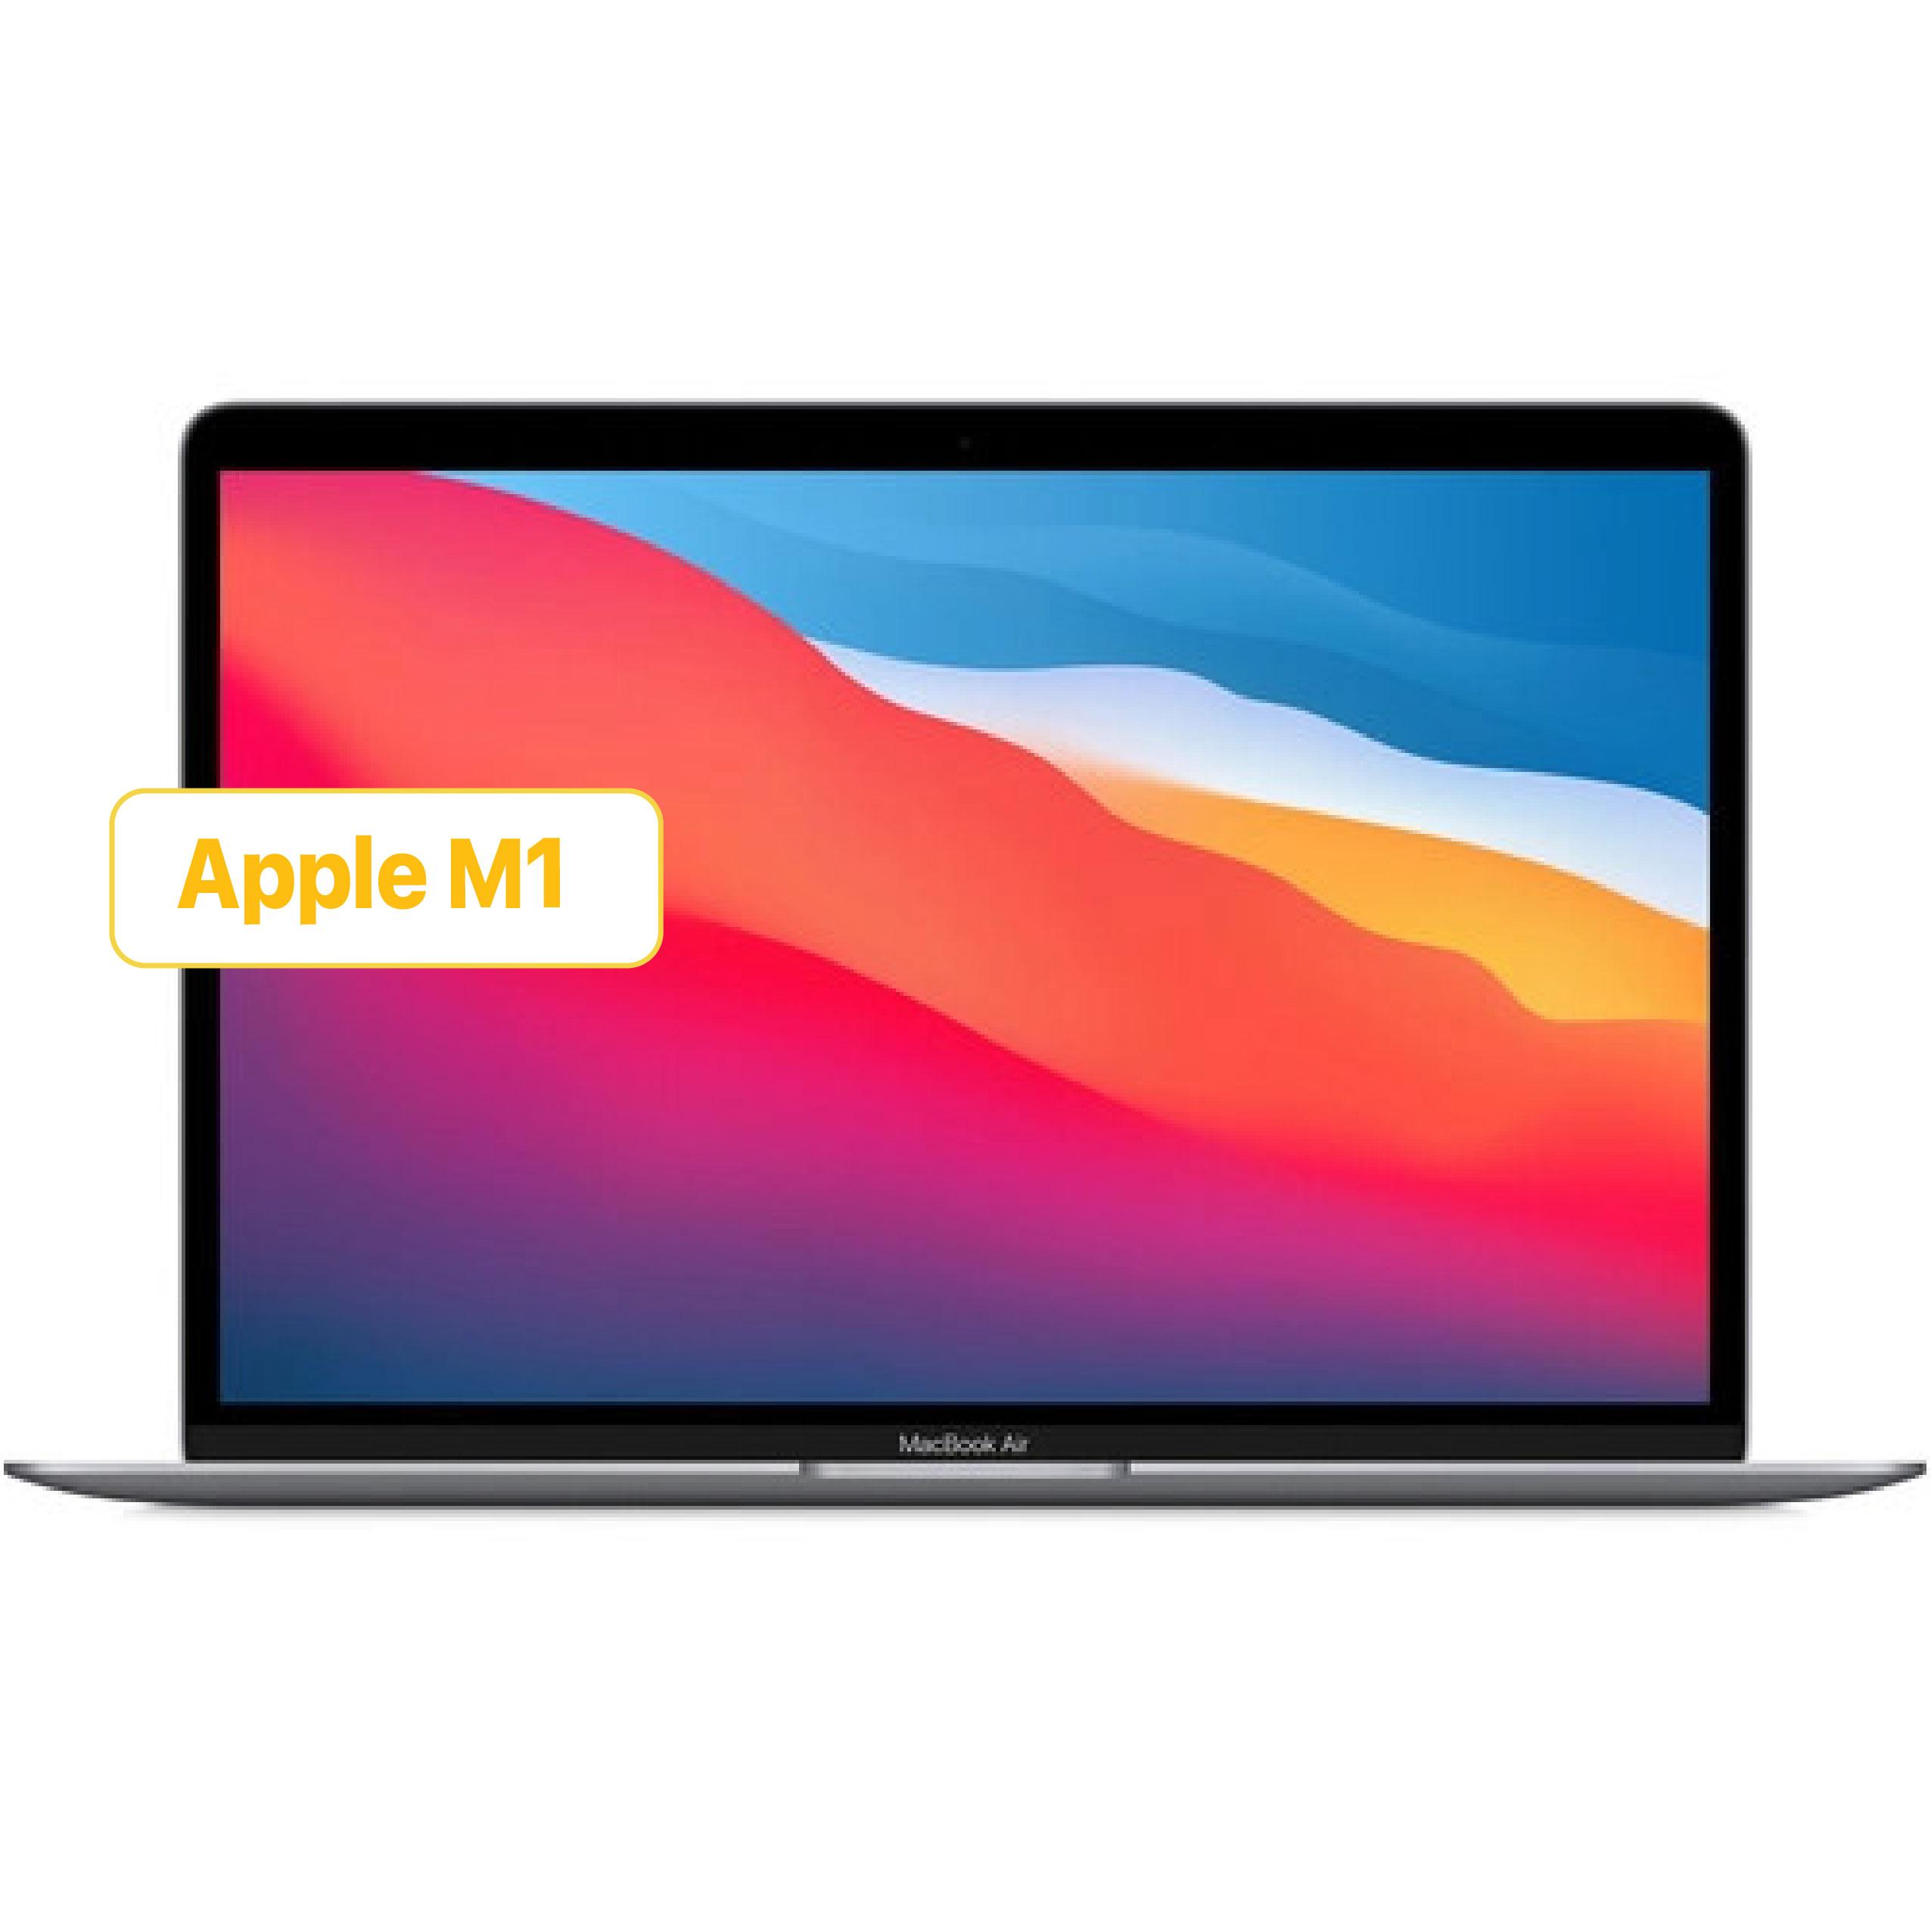 MacBook Air M1 16GB 13-inch 2020 - (M1/16GB/512GB) - New